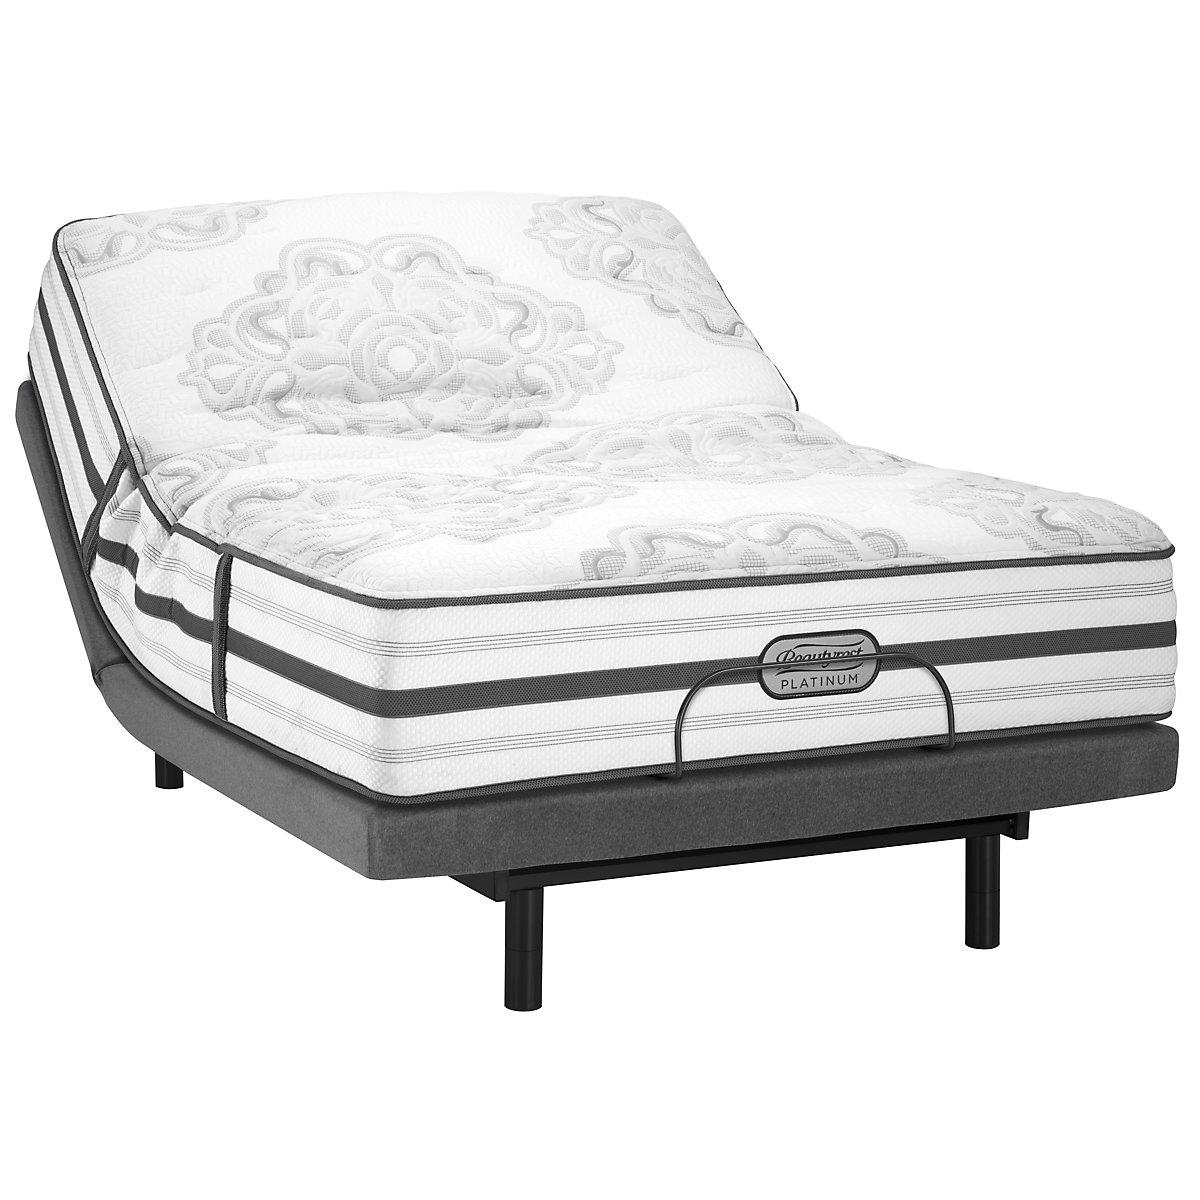 Beautyrest Platinum Brittany Plush Innerspring Select Adjustable Mattress Set